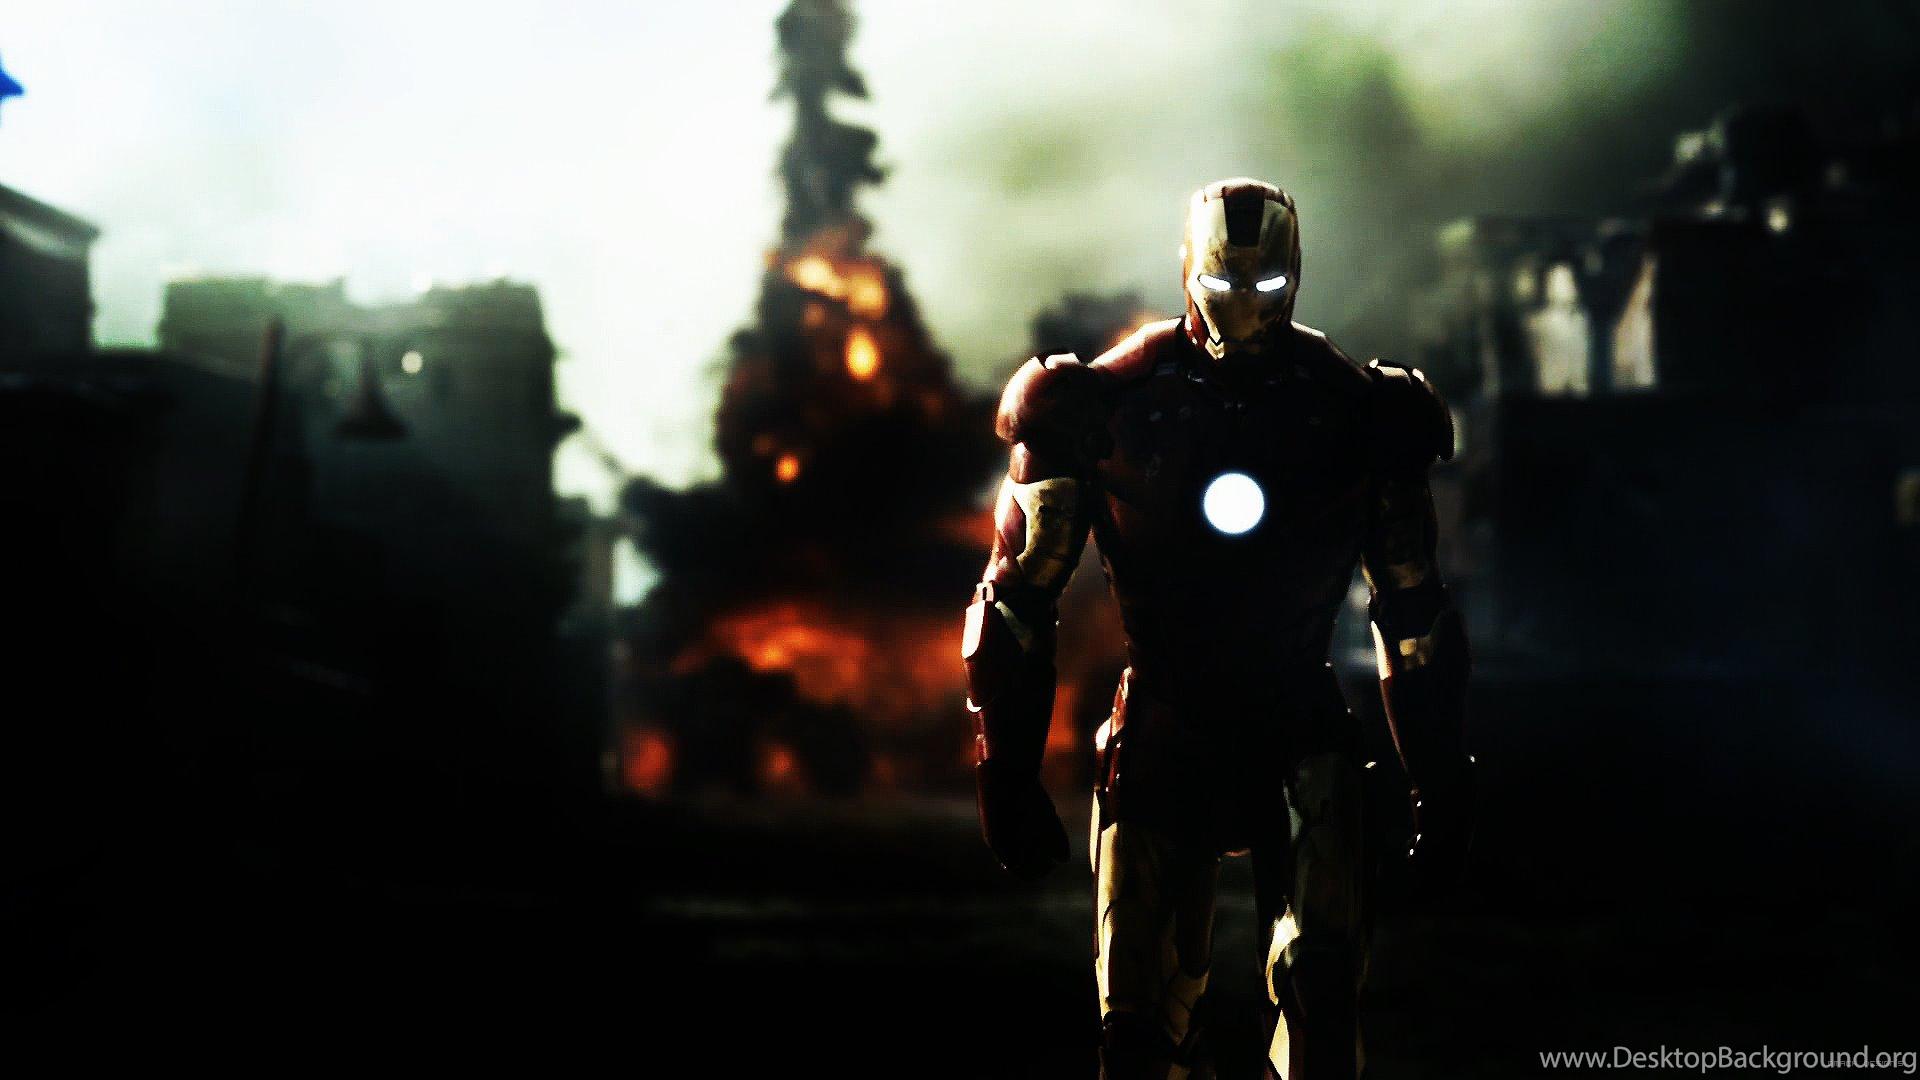 Iron Man Computer Wallpapers, Desktop Backgrounds Desktop